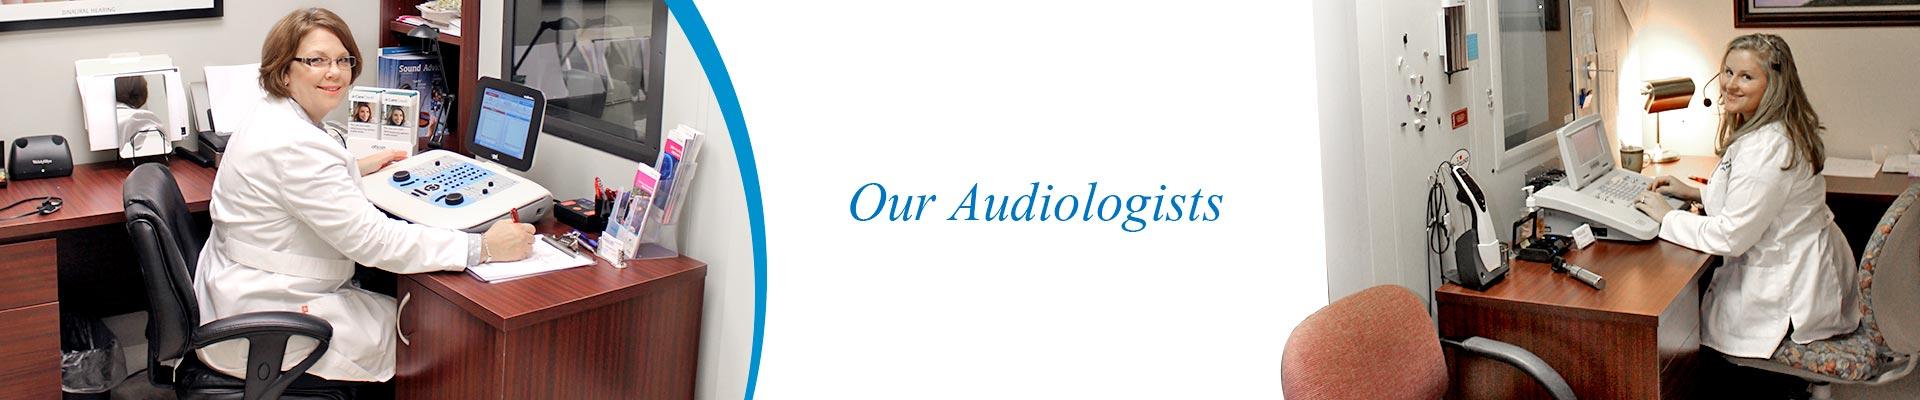 Our Audiologists - Associated Coastal ENT